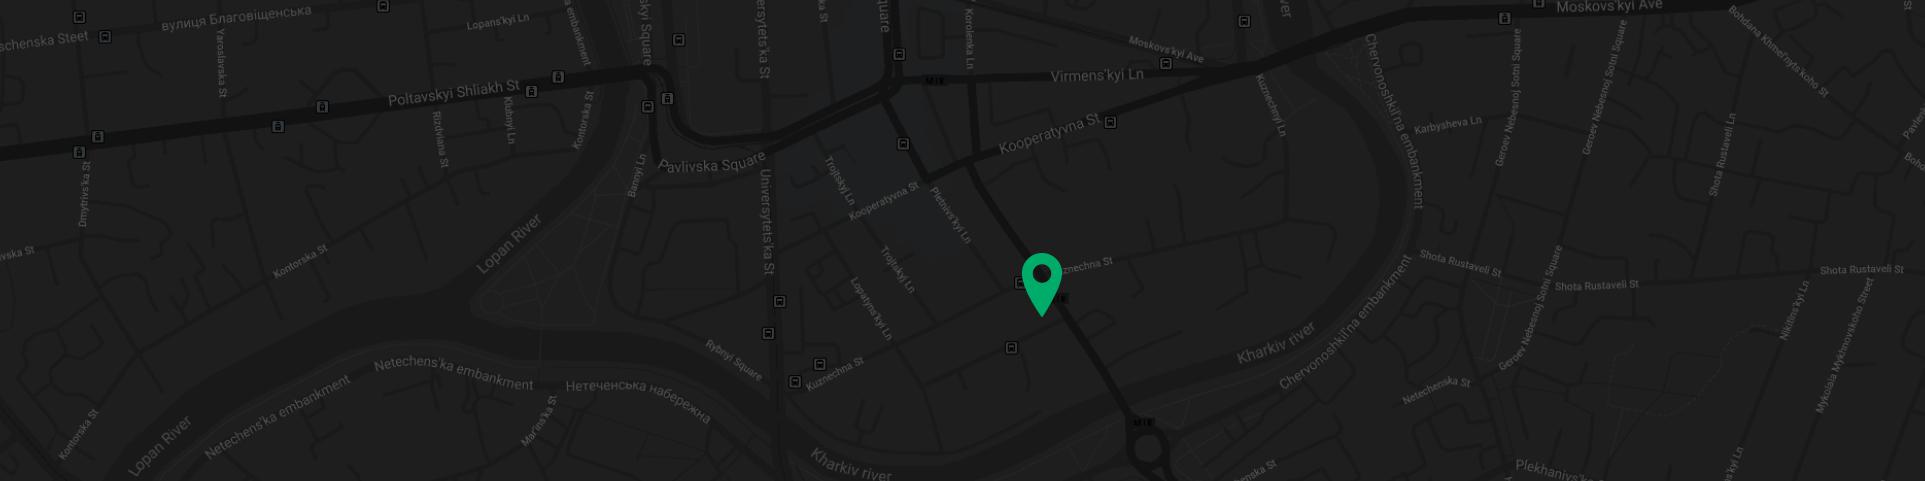 Fgfactory Location